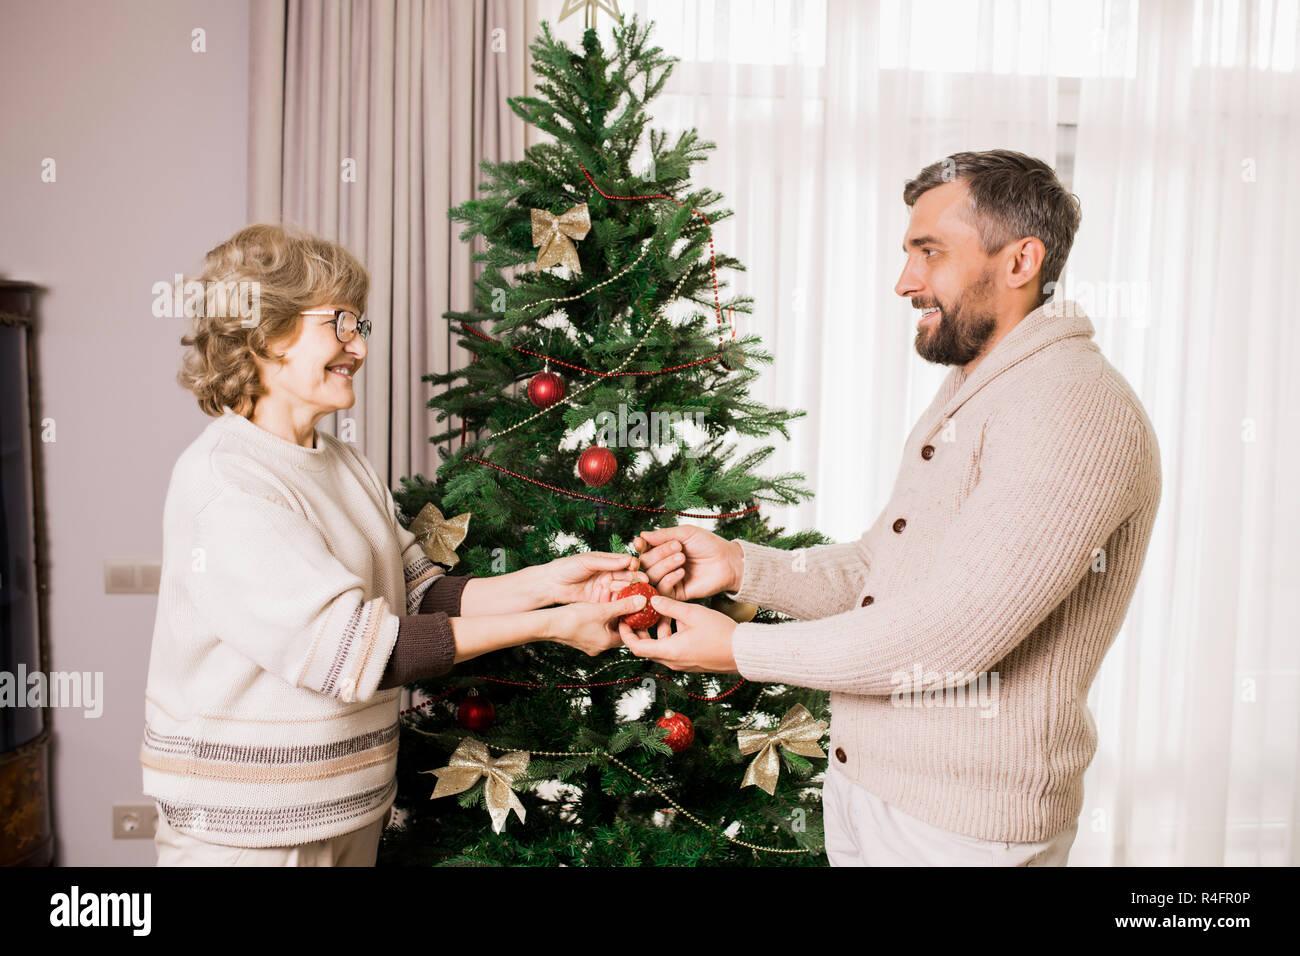 Senior Woman Decorating Tree with Son - Stock Image